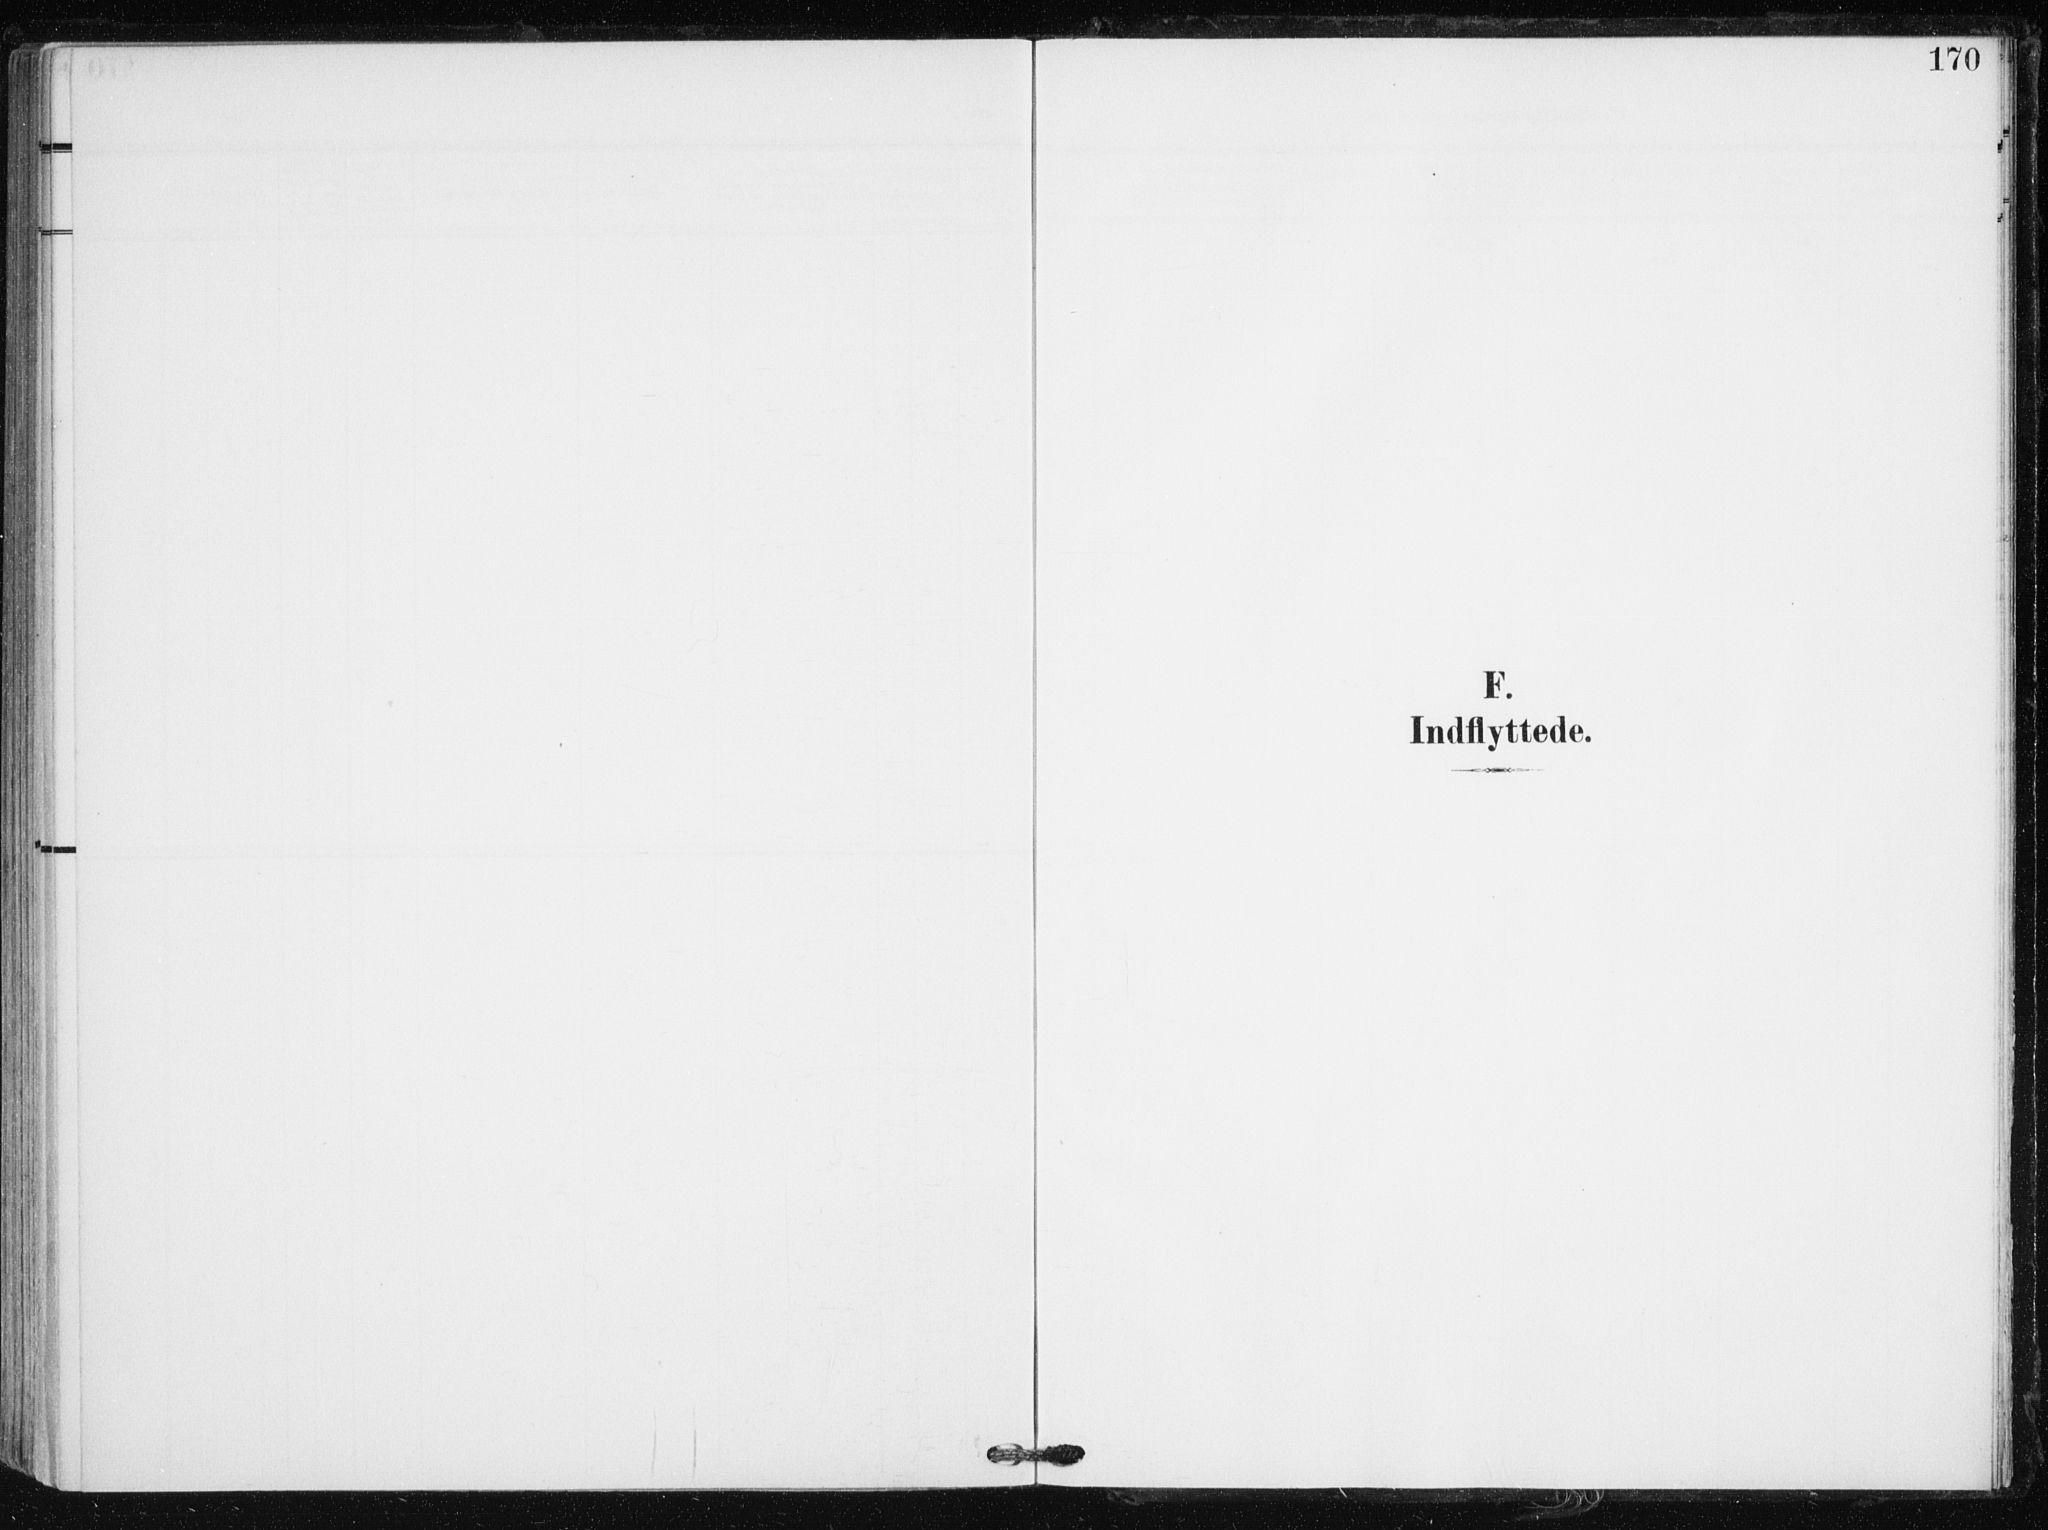 SATØ, Tranøy sokneprestkontor, I/Ia/Iaa/L0012kirke: Ministerialbok nr. 12, 1905-1918, s. 170